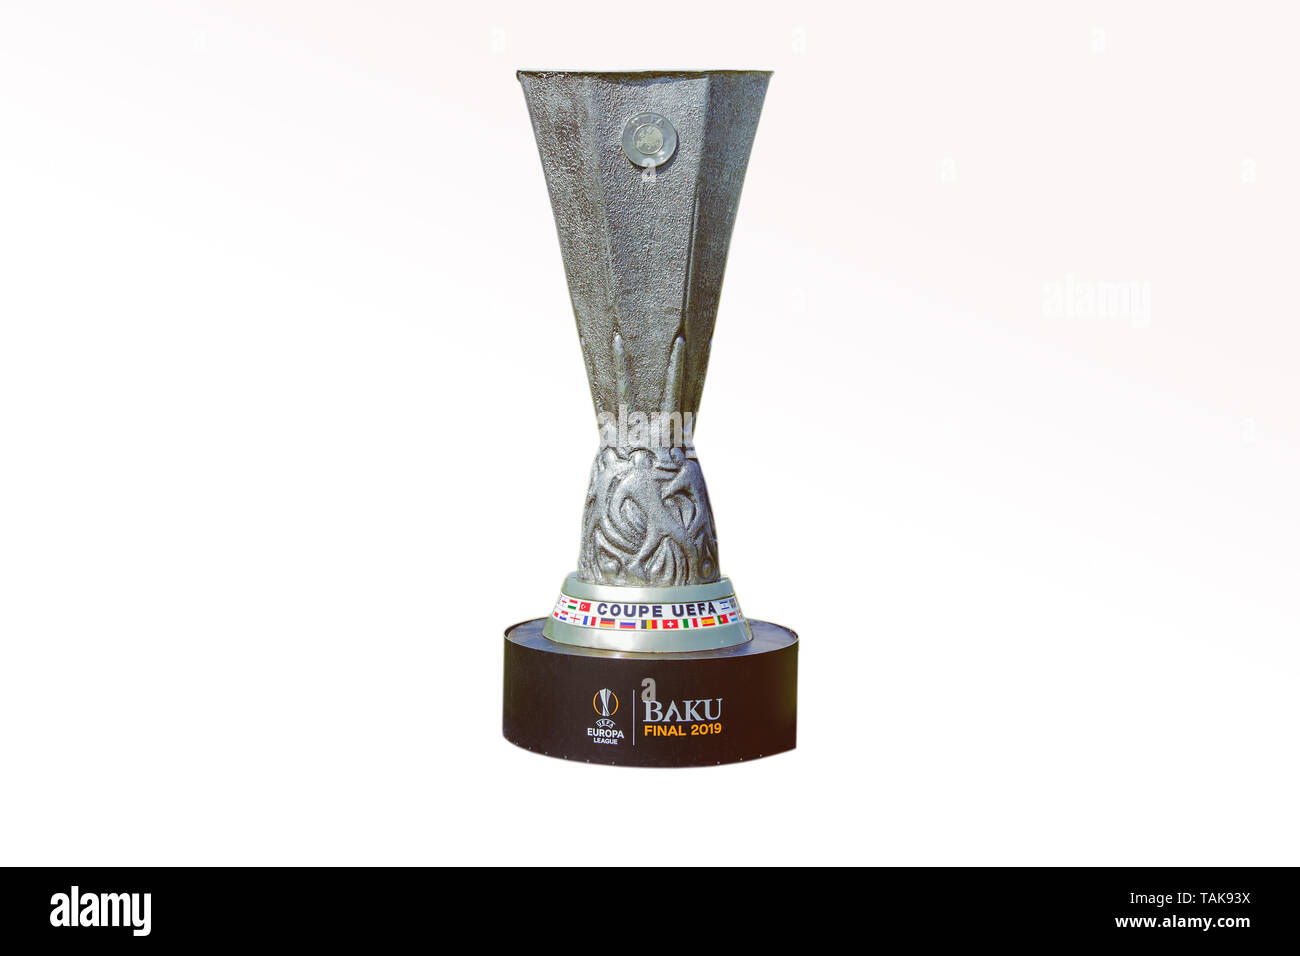 Azerbaijan Baku May 26 Uefa Champions League Uefa Cup White Backgrounds Baku Final 2019 Coupe Uefa Europa League 2019 Stock Photo Alamy